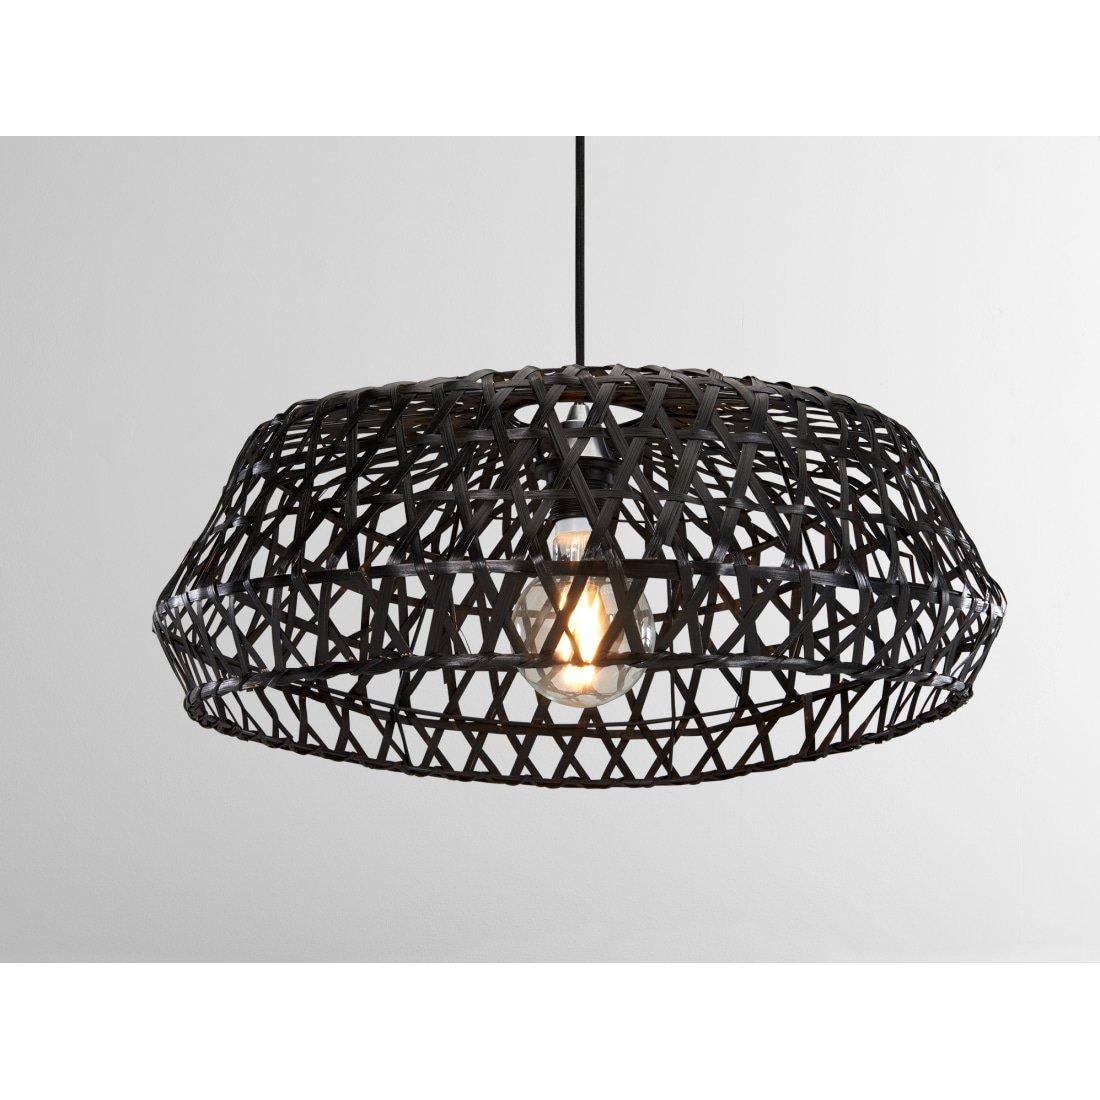 image-Jaan Large Rattan Lamp Shade, Black